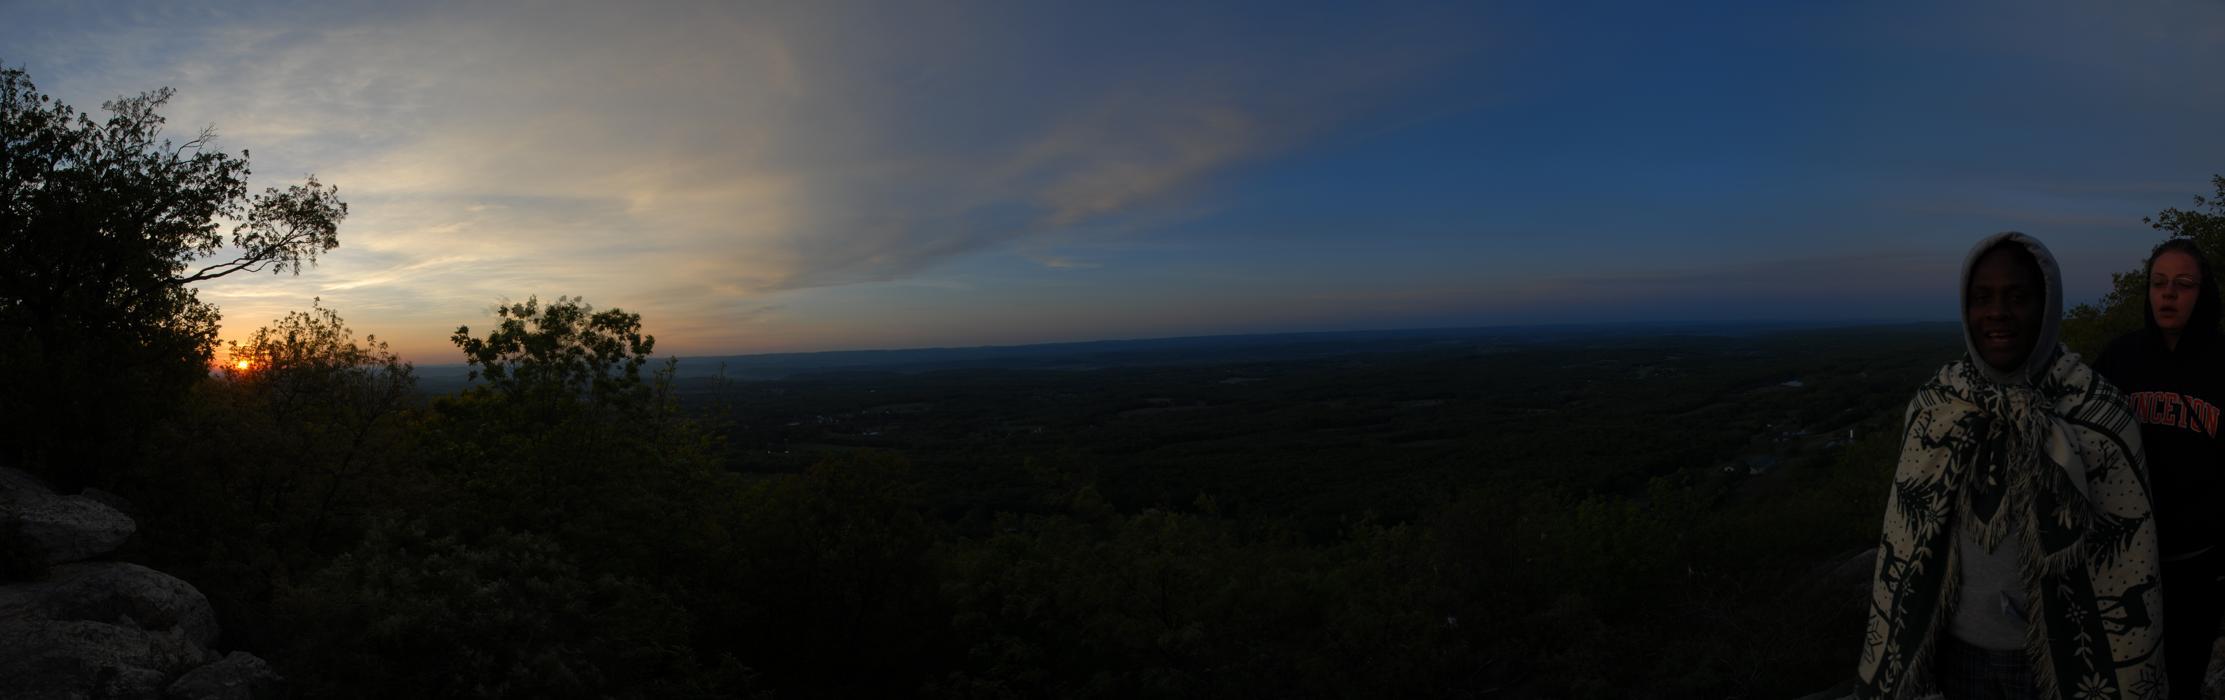 Pam, Patrick, panoramic, sunrise, trees, valley